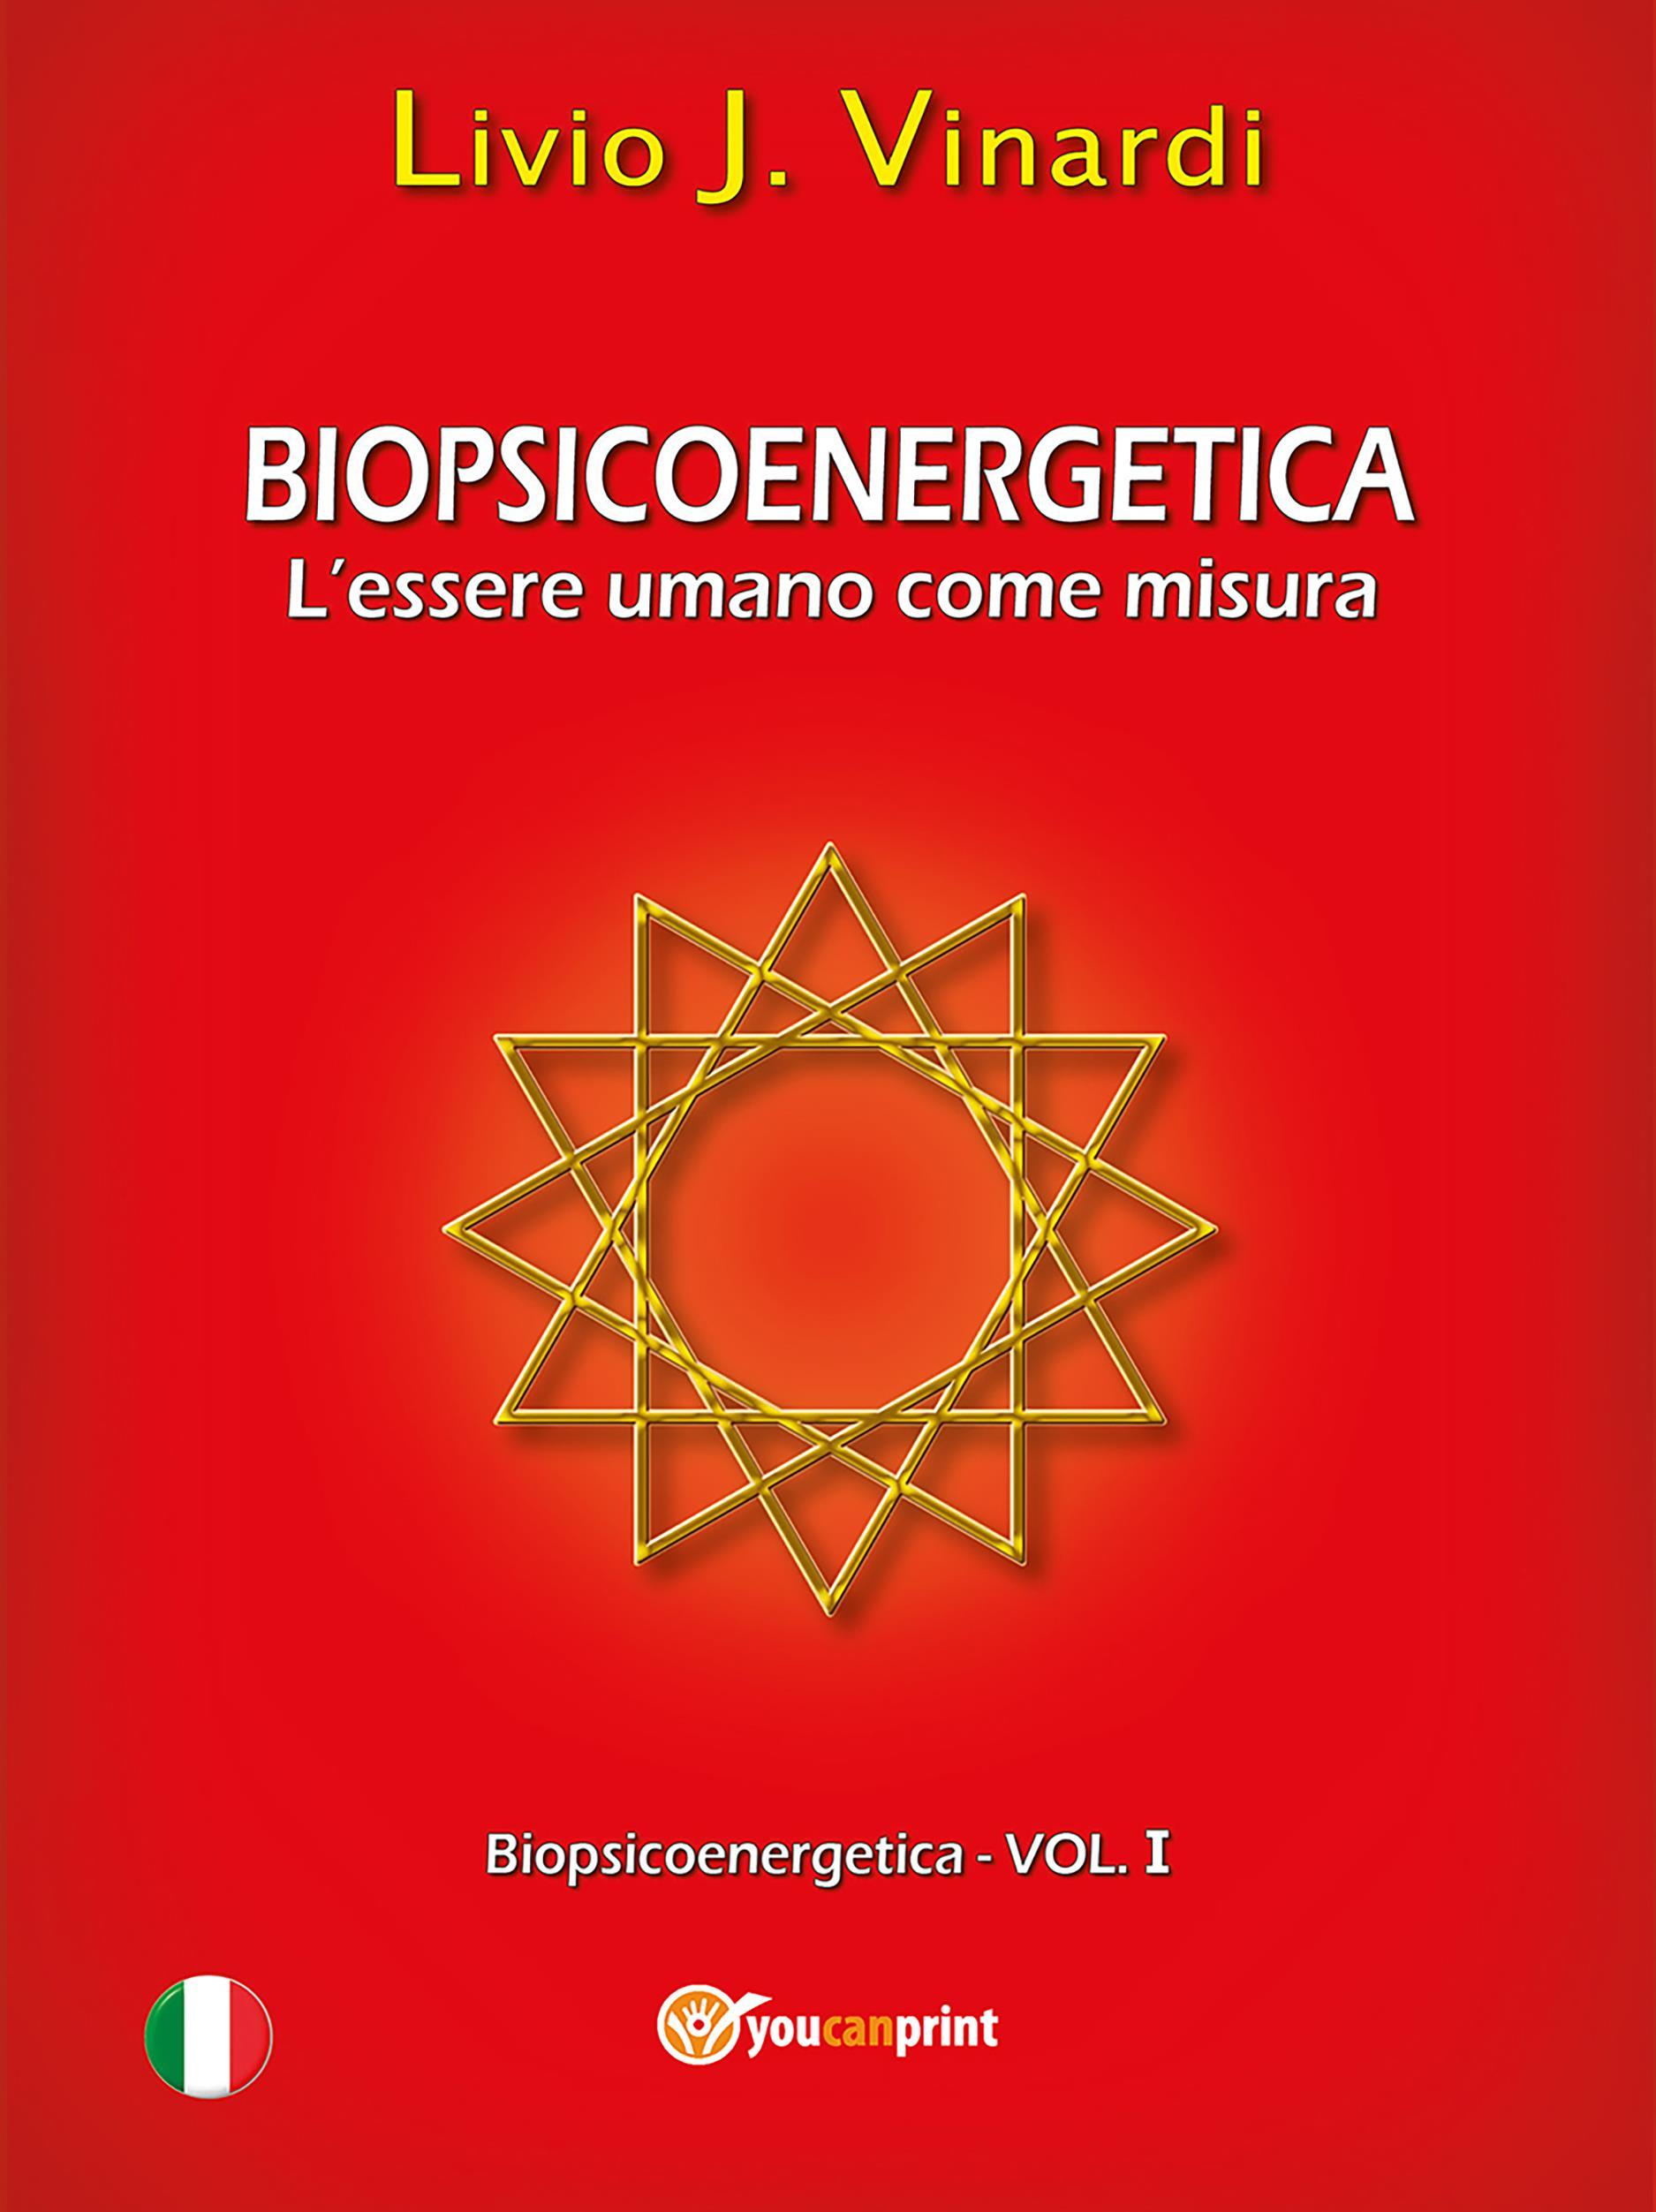 Biopsicoenergetica – L'essere umano come misura (Vol I)